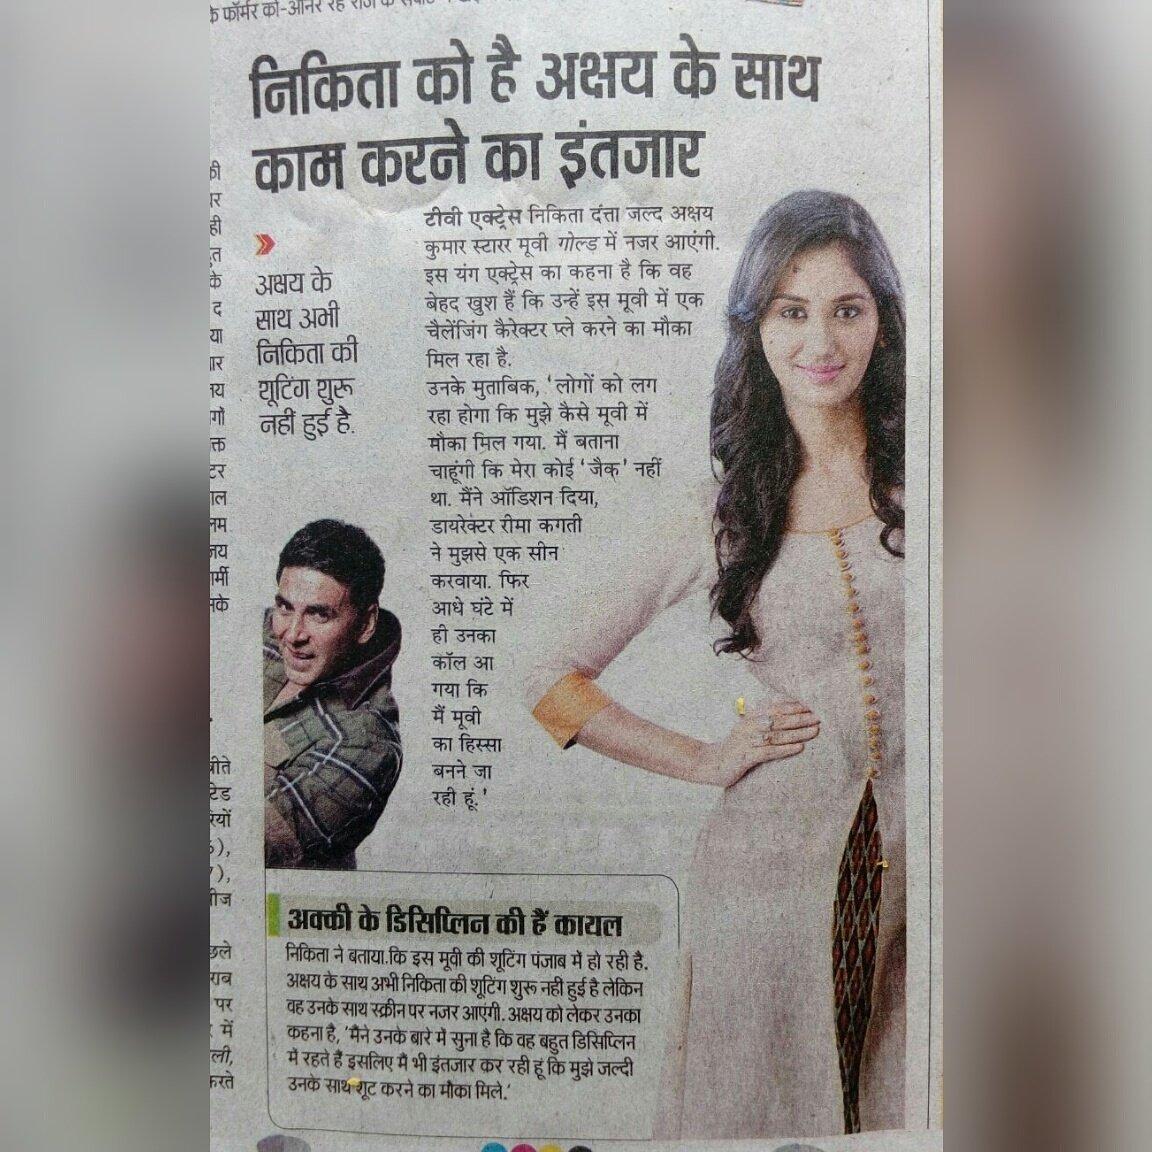 Newspaper cutting of an article...  Niki to share screen space with Akshay Kumar in #Gold  @nikifyinglife @akshaykumar<br>http://pic.twitter.com/LVbcXY1Ci5